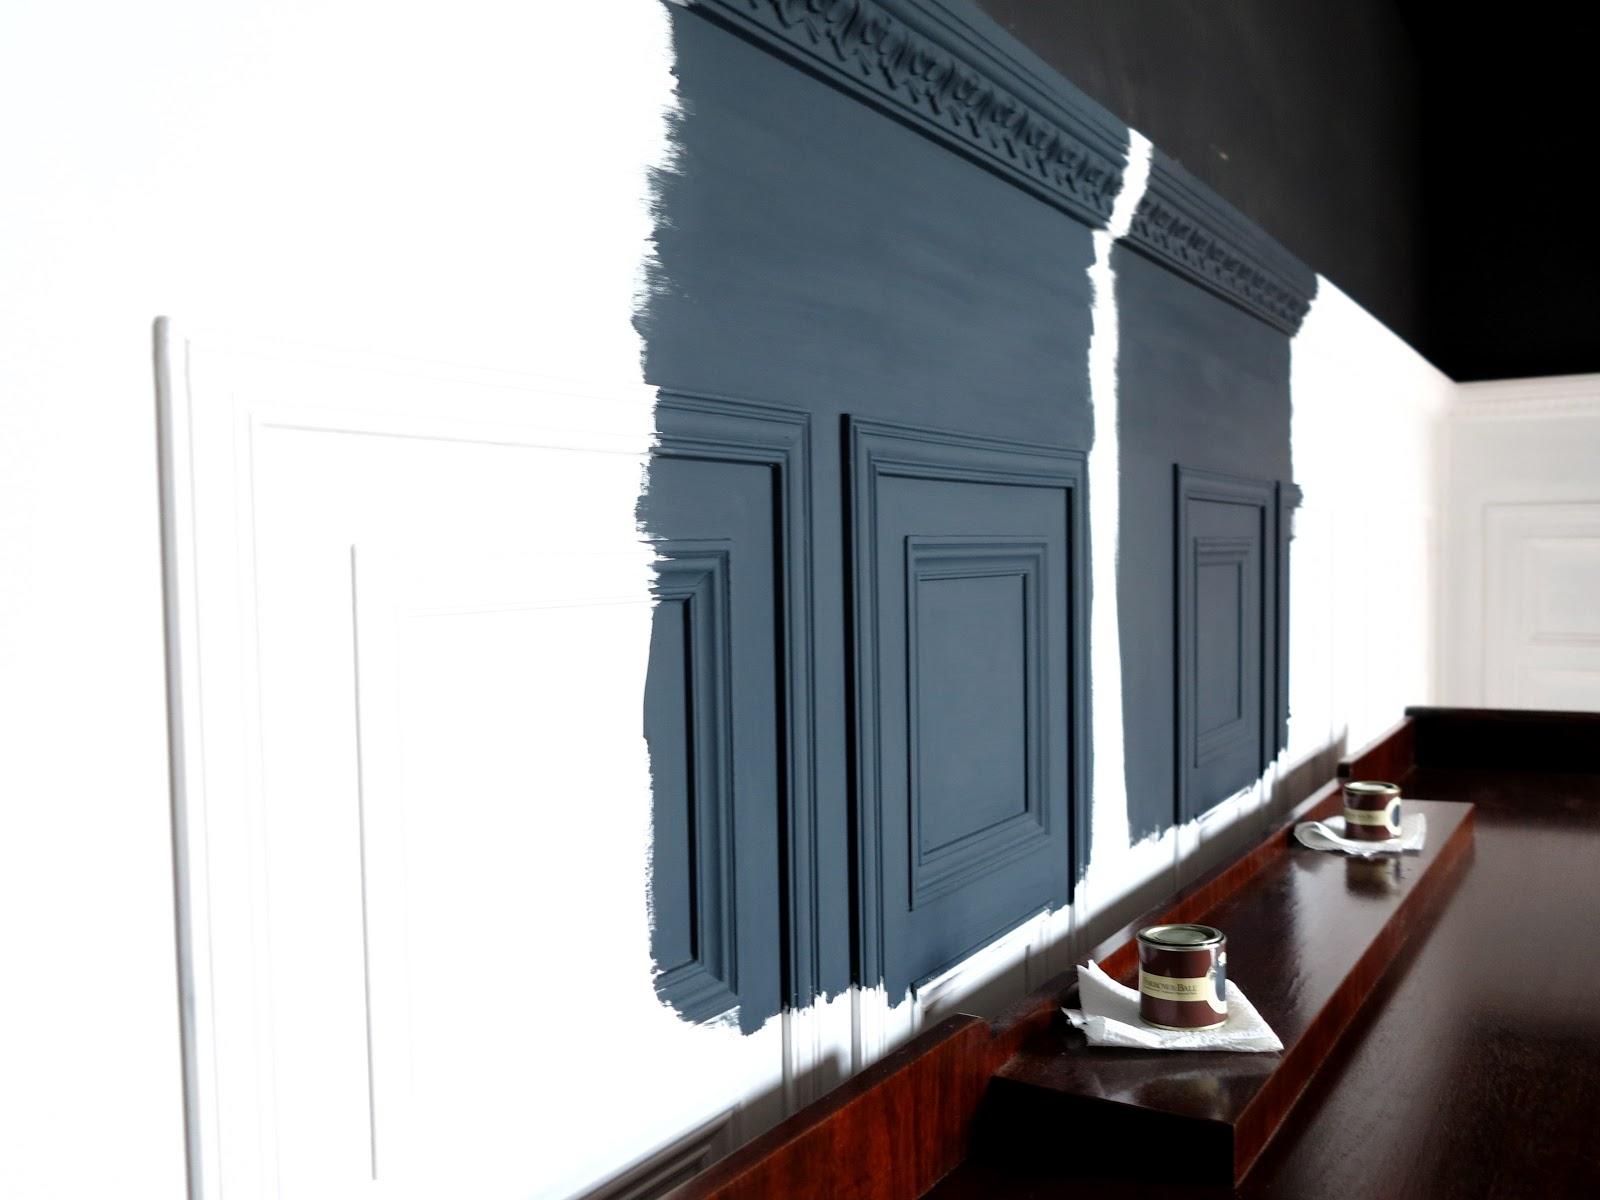 47 park avenue january 2013. Black Bedroom Furniture Sets. Home Design Ideas